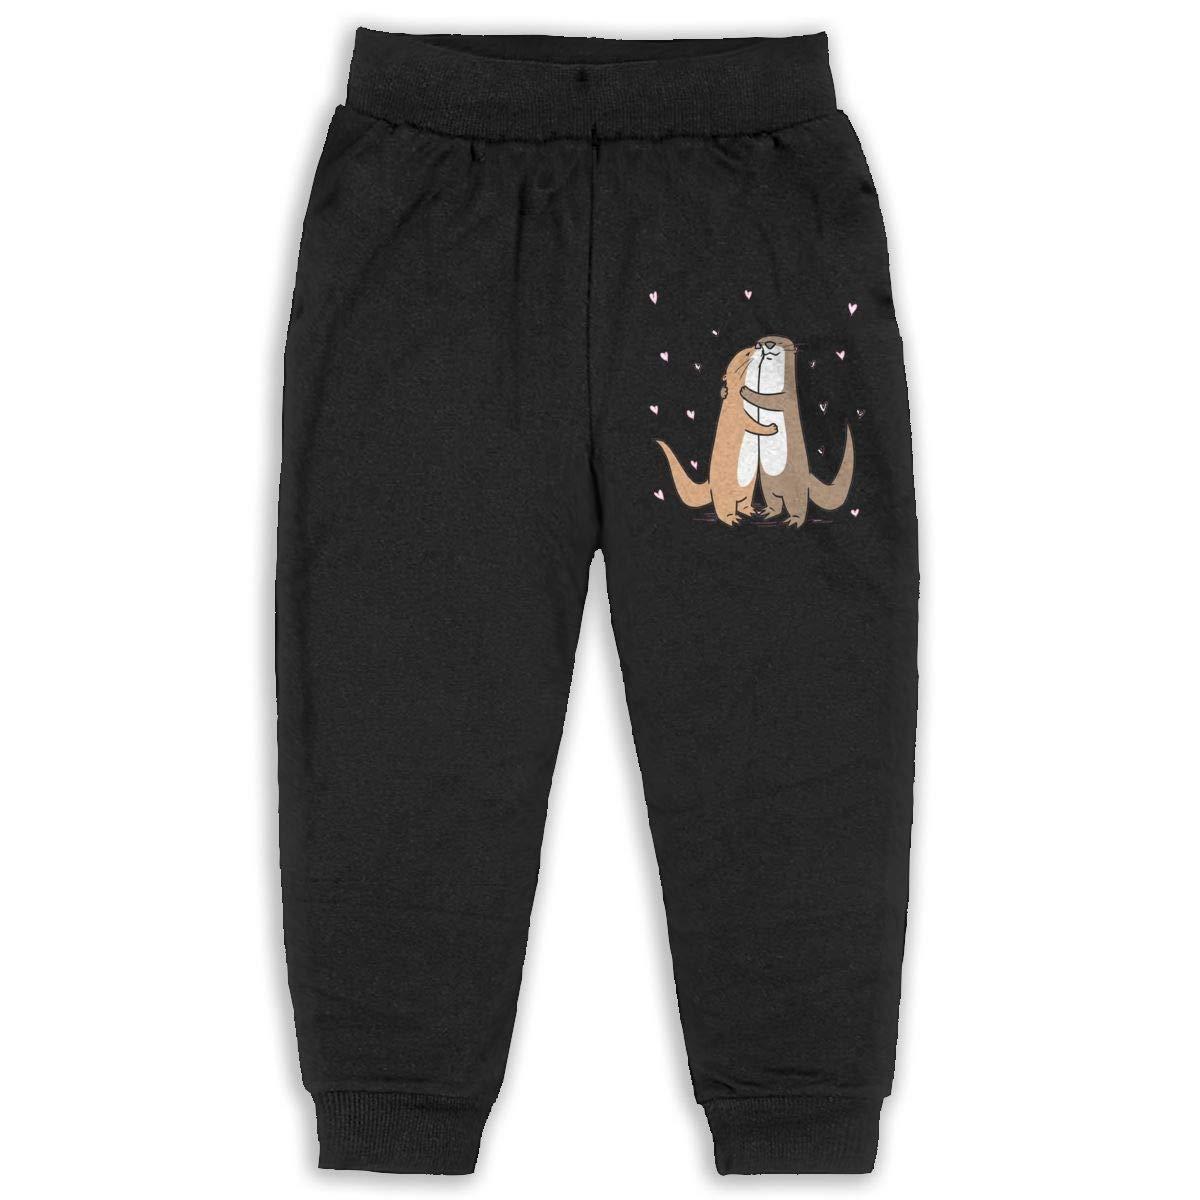 JAWANNA Love of Cartoon Otter Heart Boys Cotton Sweatpants Black Age 2T-6T 2-6 Years